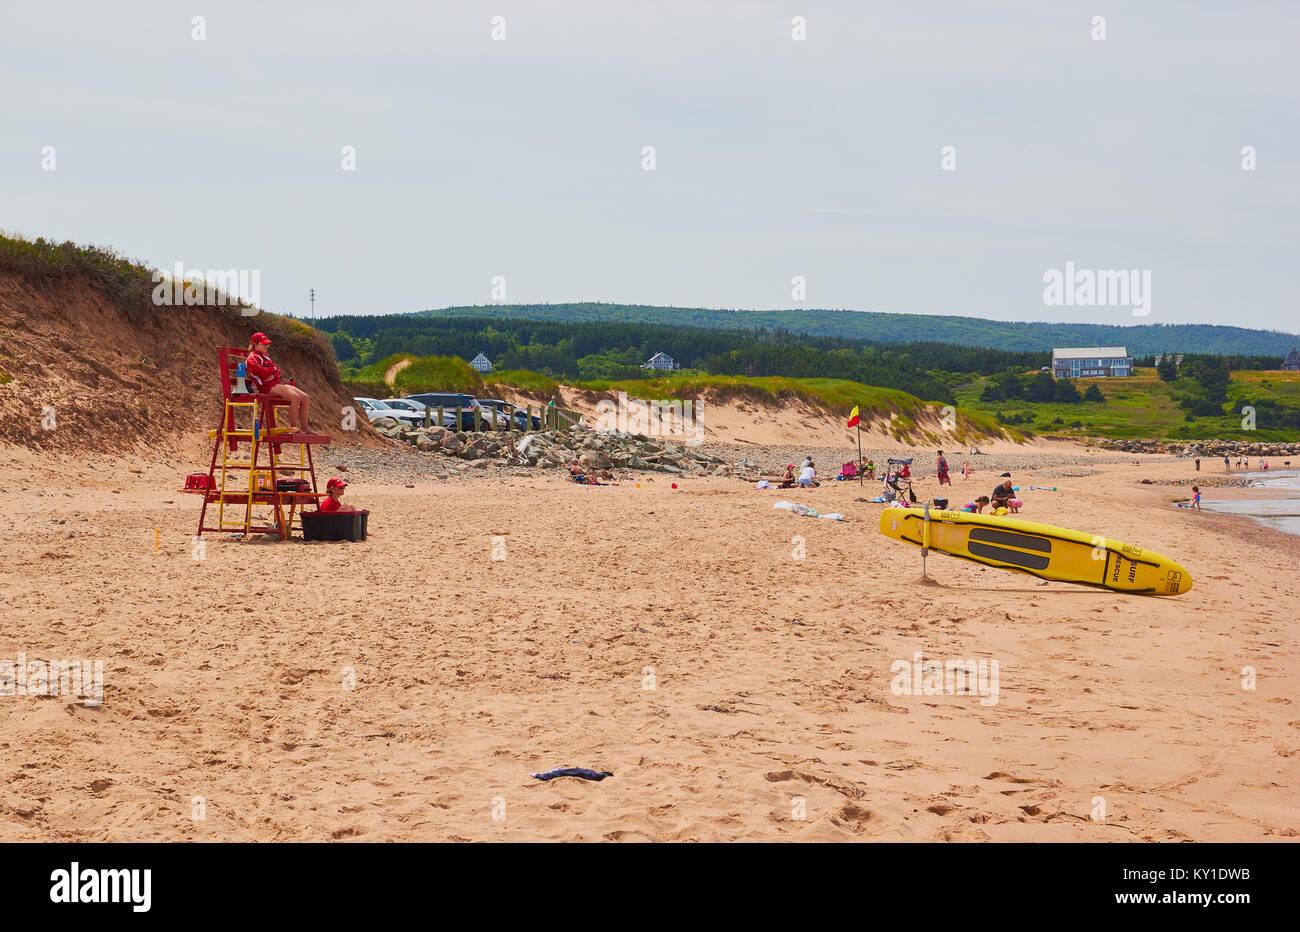 Lifeguards, Inverness beach, Inverness County, Cape Breton Island, Nova Scoatia, Canada. West coast of Cape Breton Stock Photo